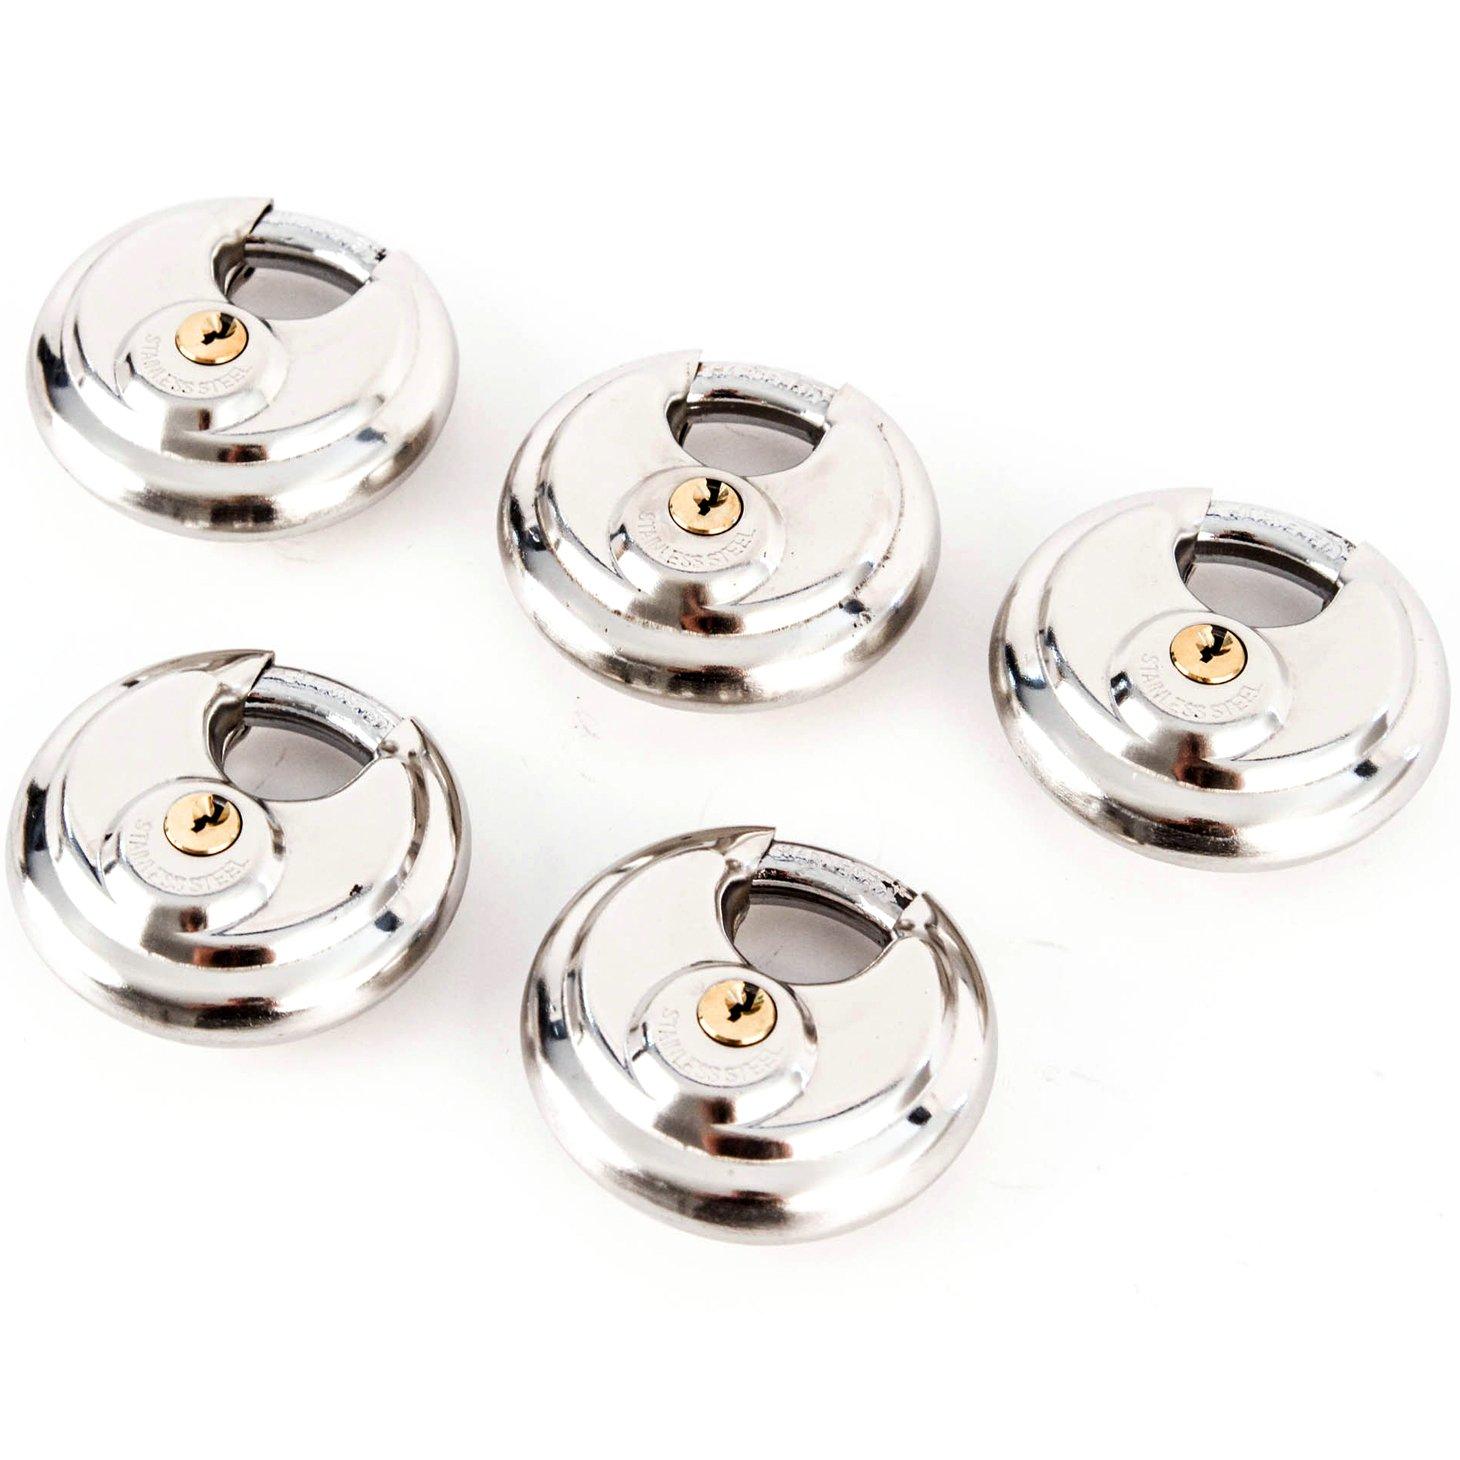 5 Stainless Steel Armor Disc Padlocks Trailer / Self Storage Locks Keyed Alike